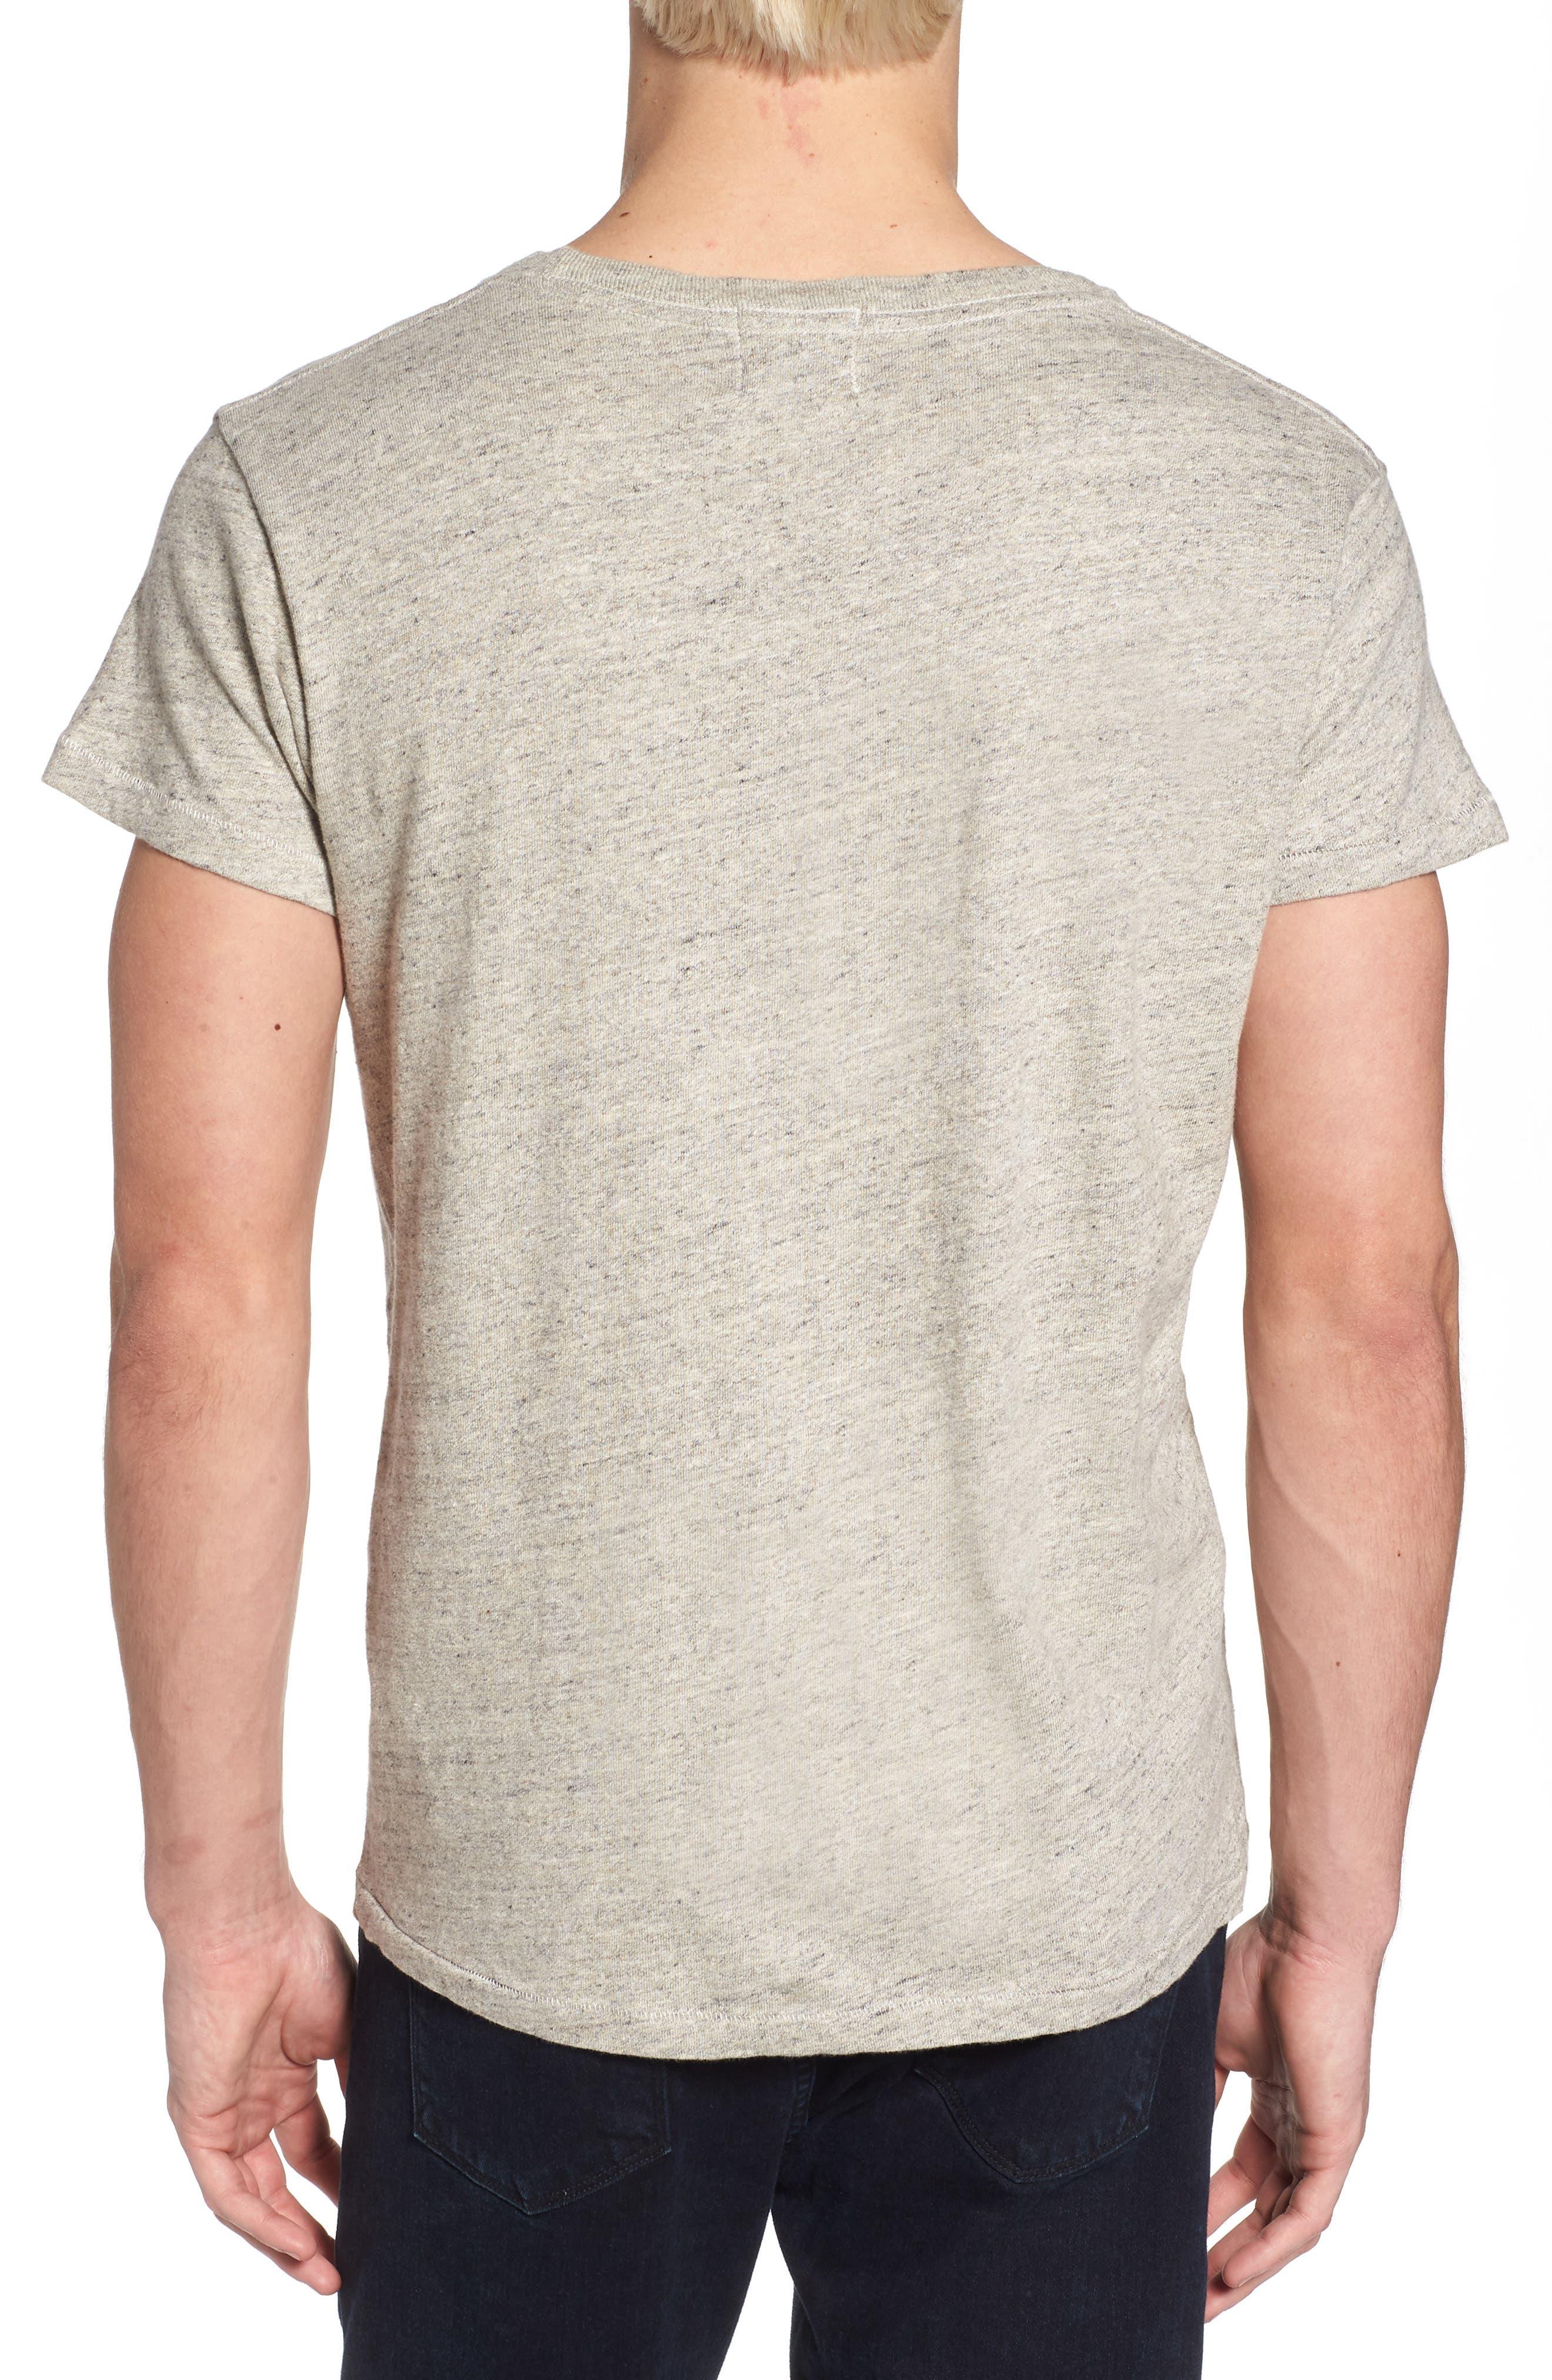 Levi's Vintage Clothing 1950s Sportswear Pocket T-Shirt,                             Alternate thumbnail 2, color,                             Grey